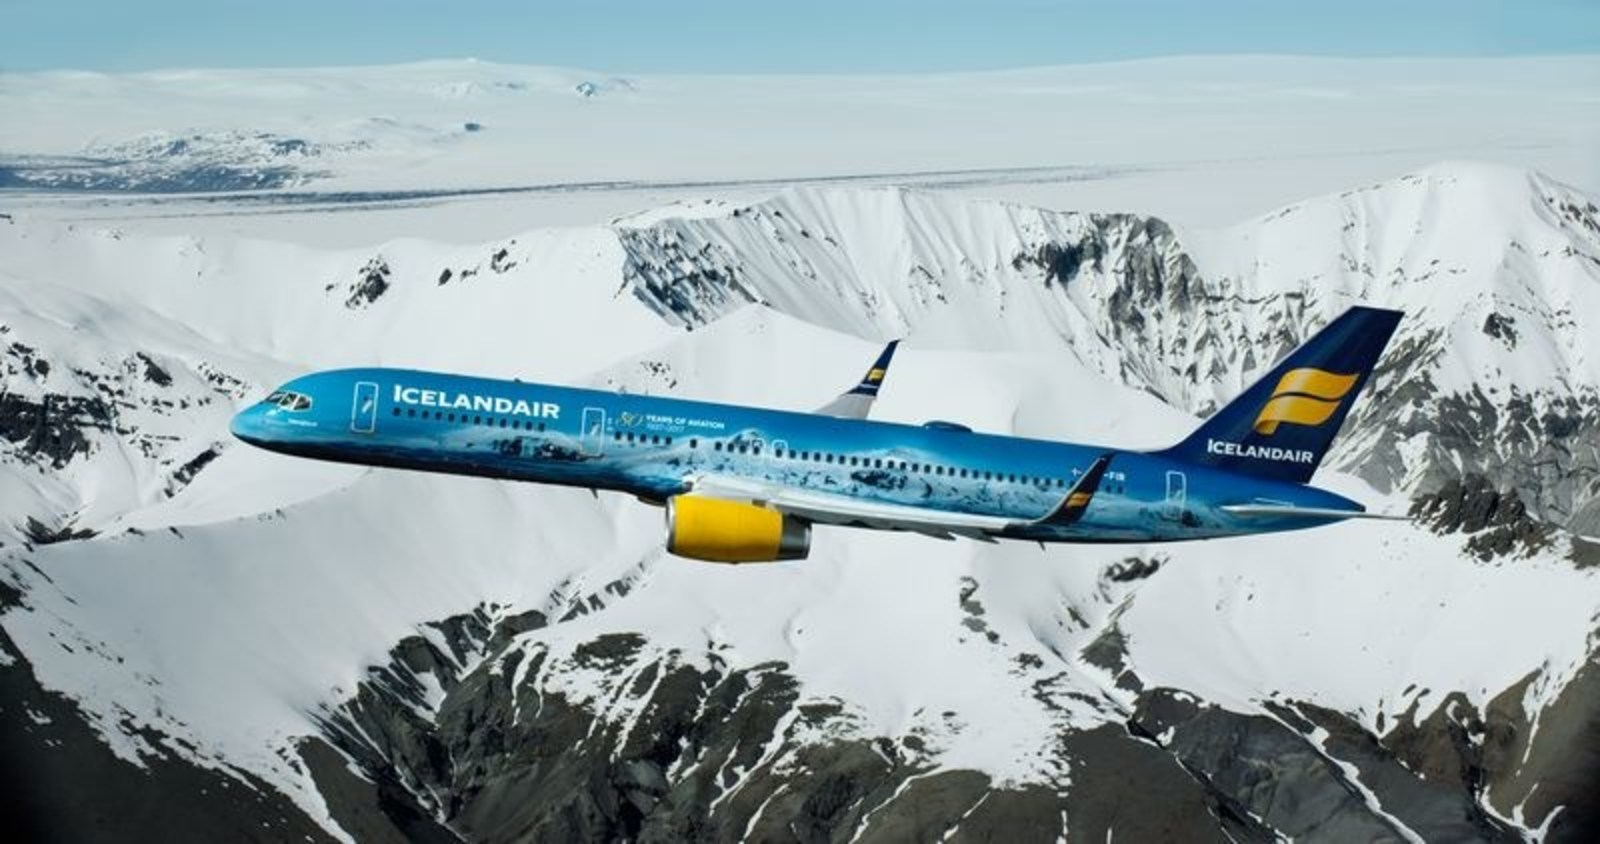 Icelandairs Boeing 757-200 Hekla Aurora i den særlige Northern Light-bemaling. (Foto: Icelandair/DFW International Airport)